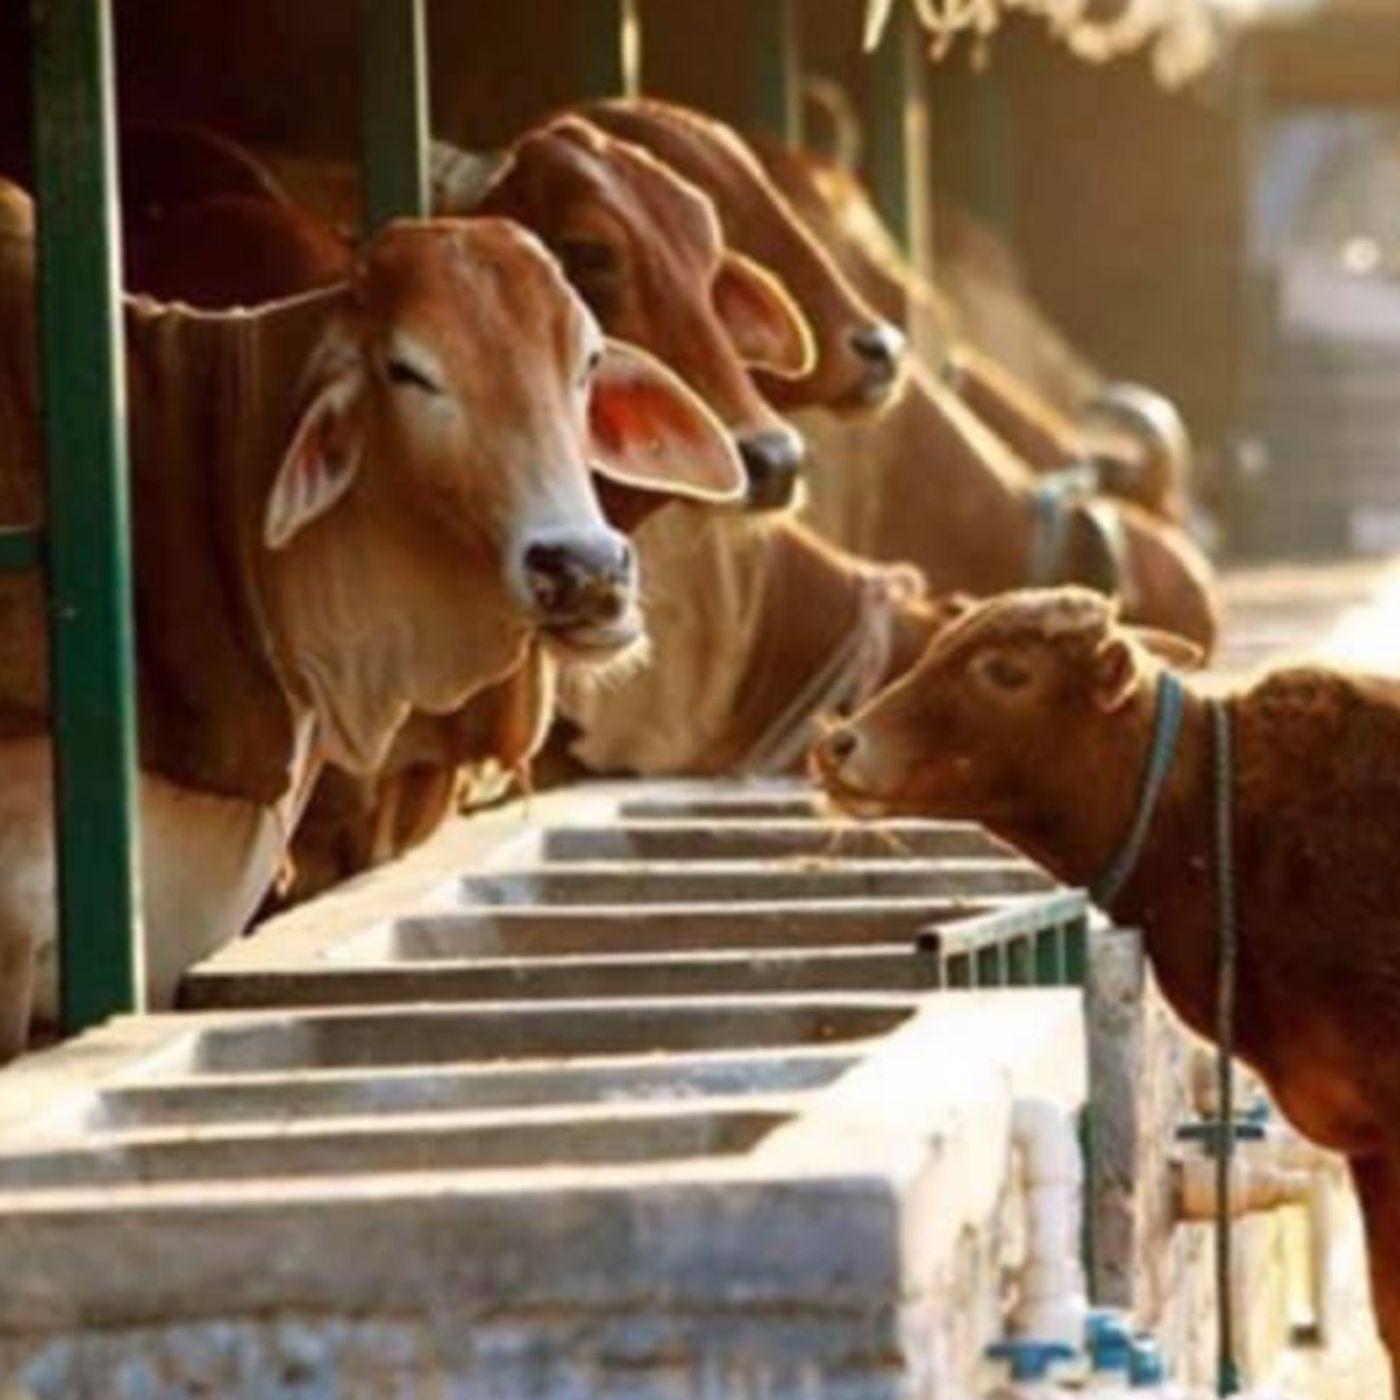 Beejom Farm - Animal Sanctuary and Sustainable Regenerative Agriculture